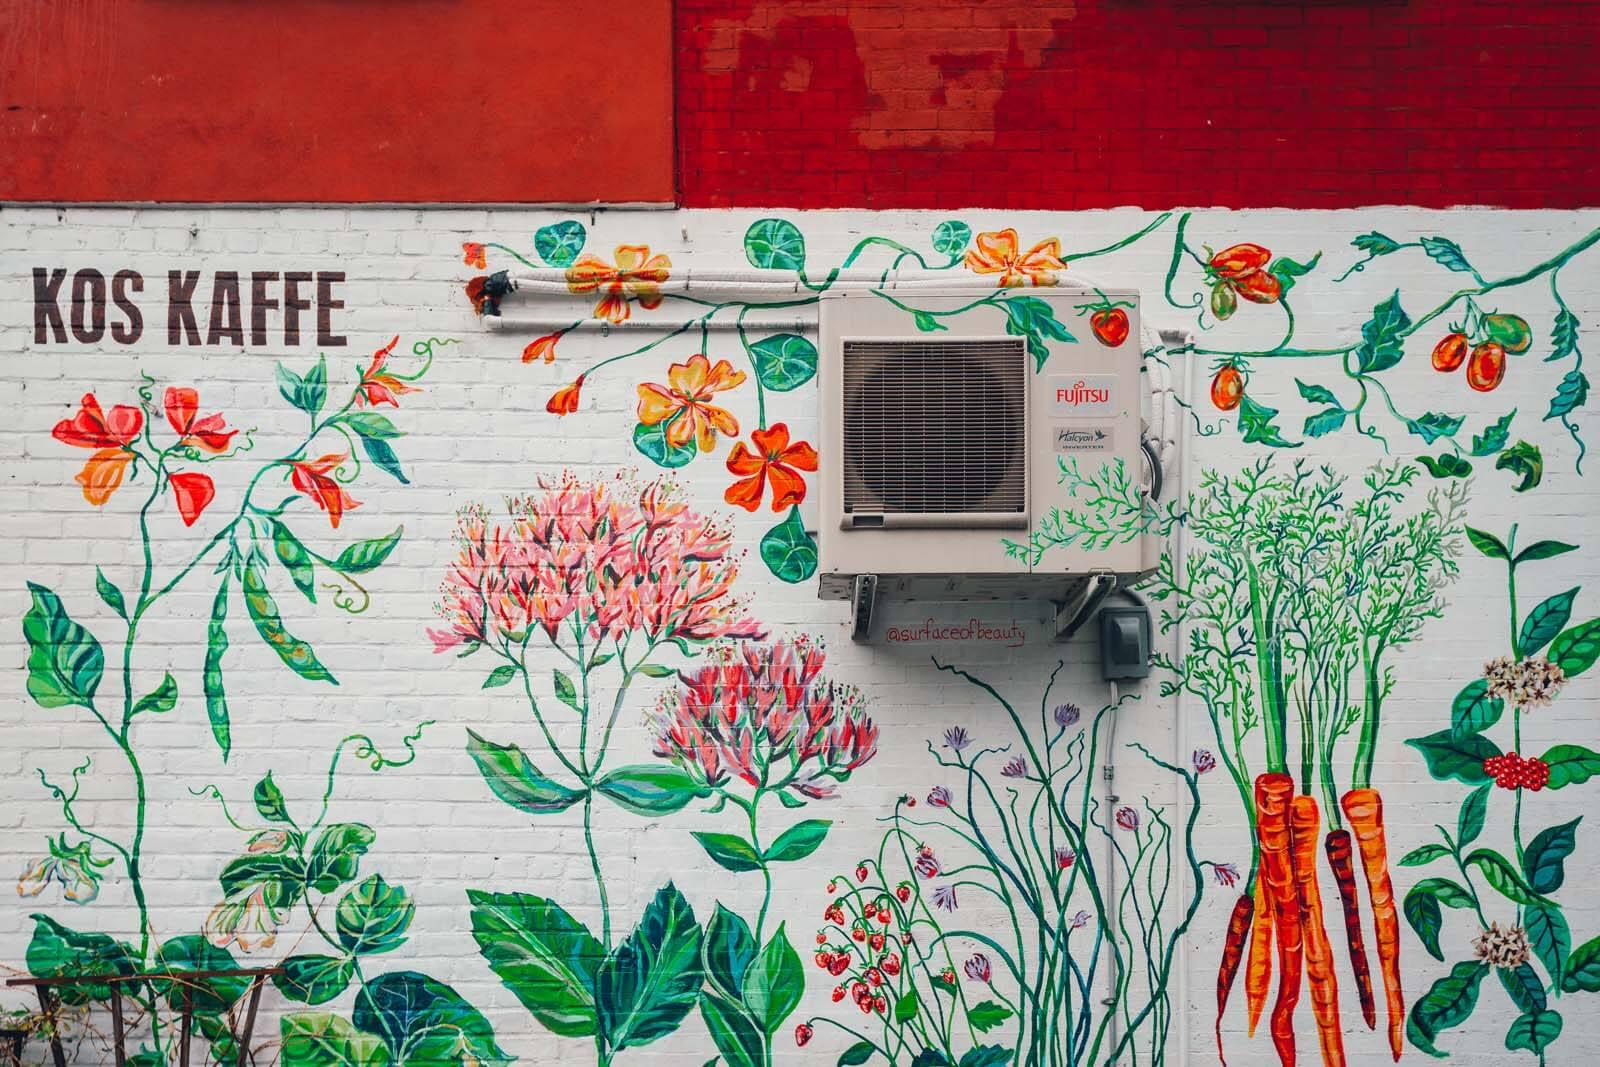 Garden mural at Kos Kaffee in Park Slope